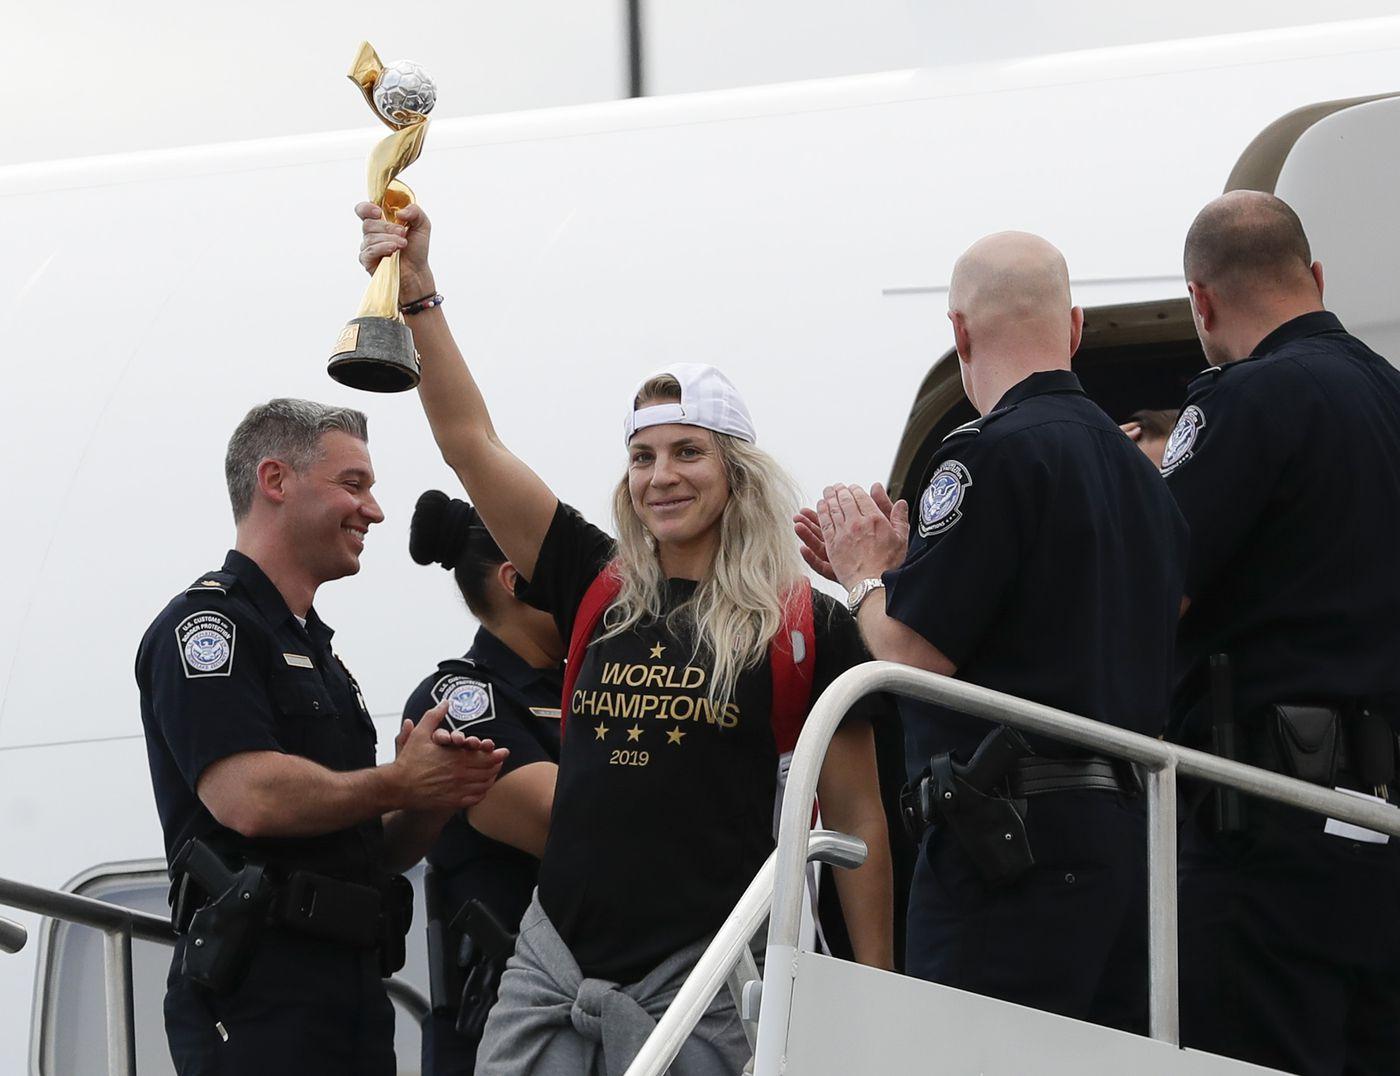 After World Cup title win, Julie Ertz returns to NWSL's